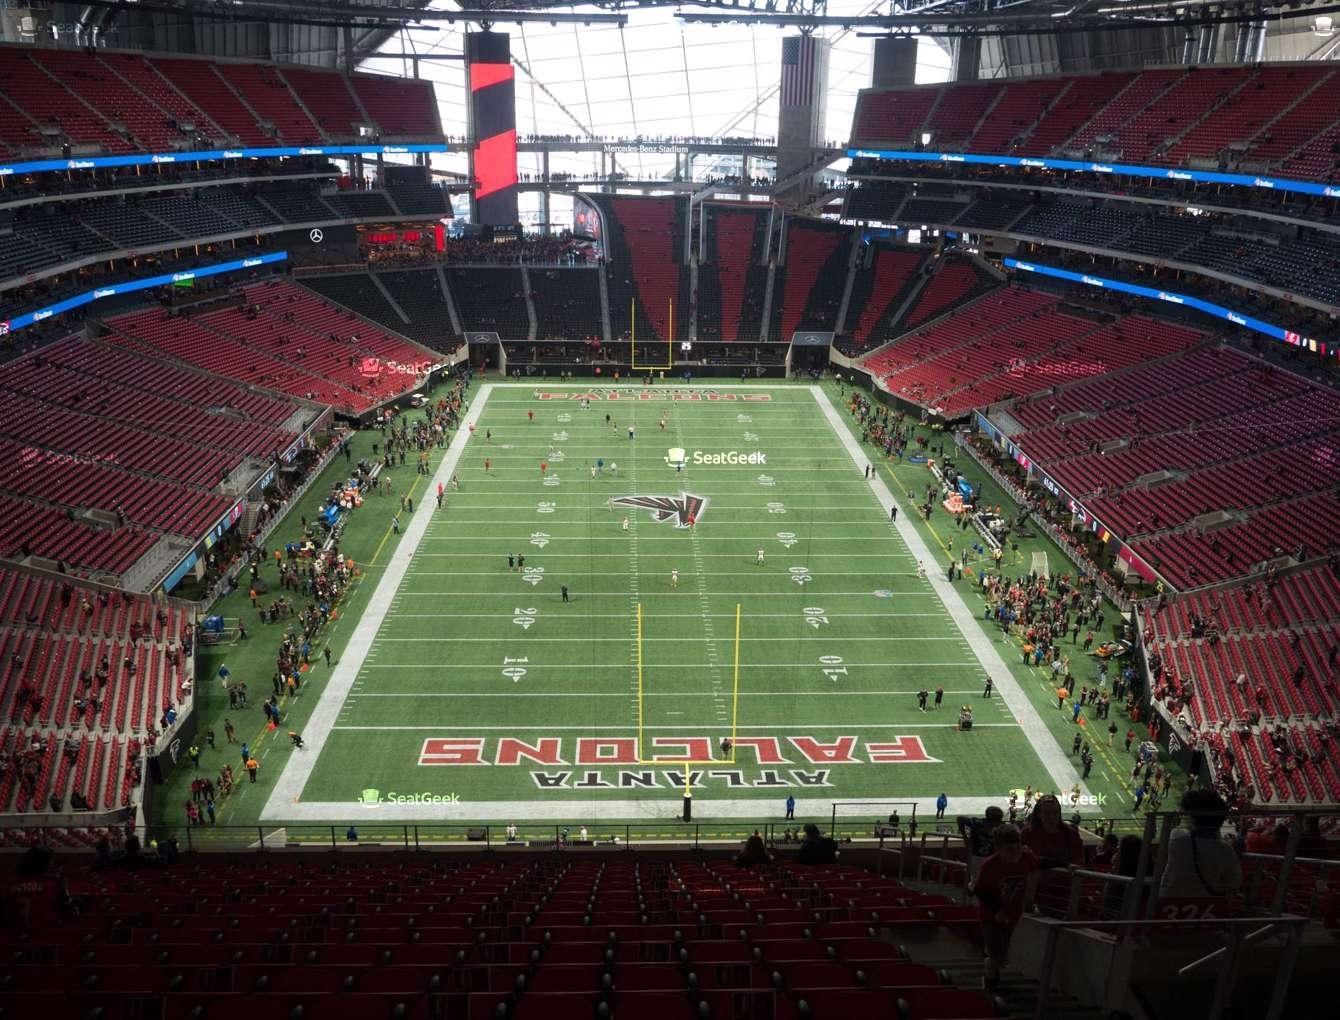 Mercedes-Benz Stadium Section 326 Seat Views | Seatgeek with Atlanta Stadium Super Bowl Seating Capacity